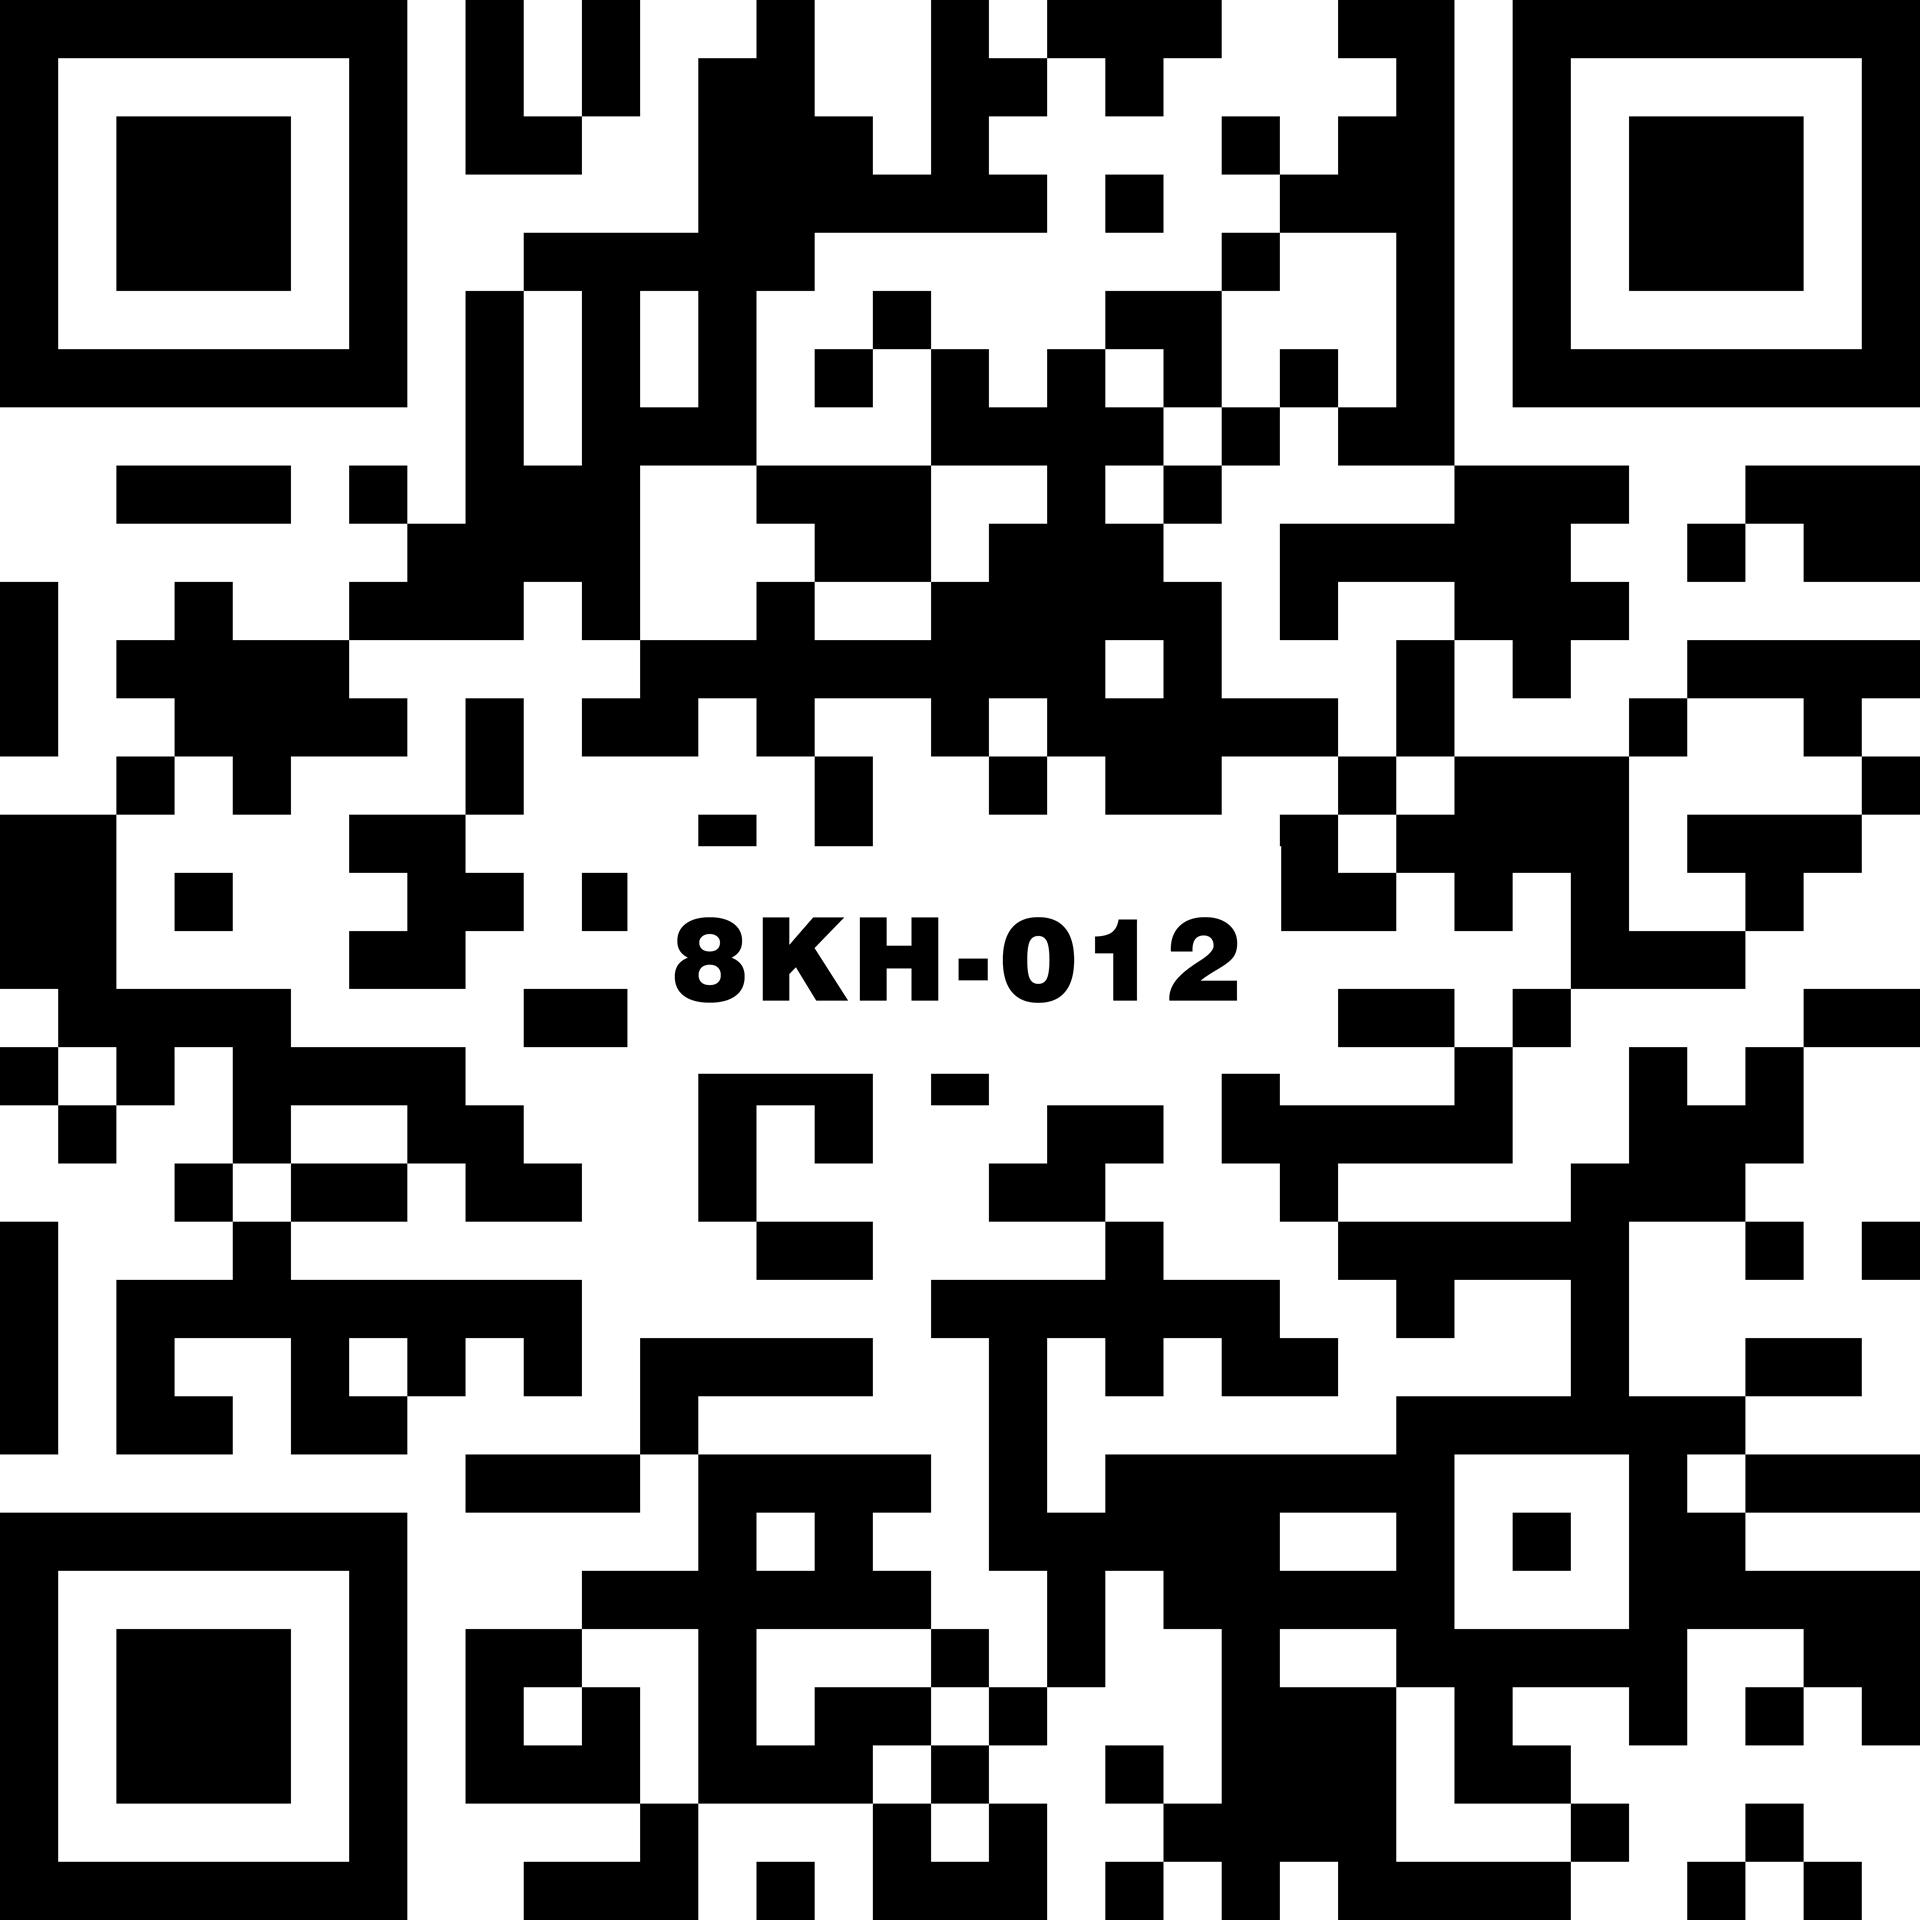 8KH-012